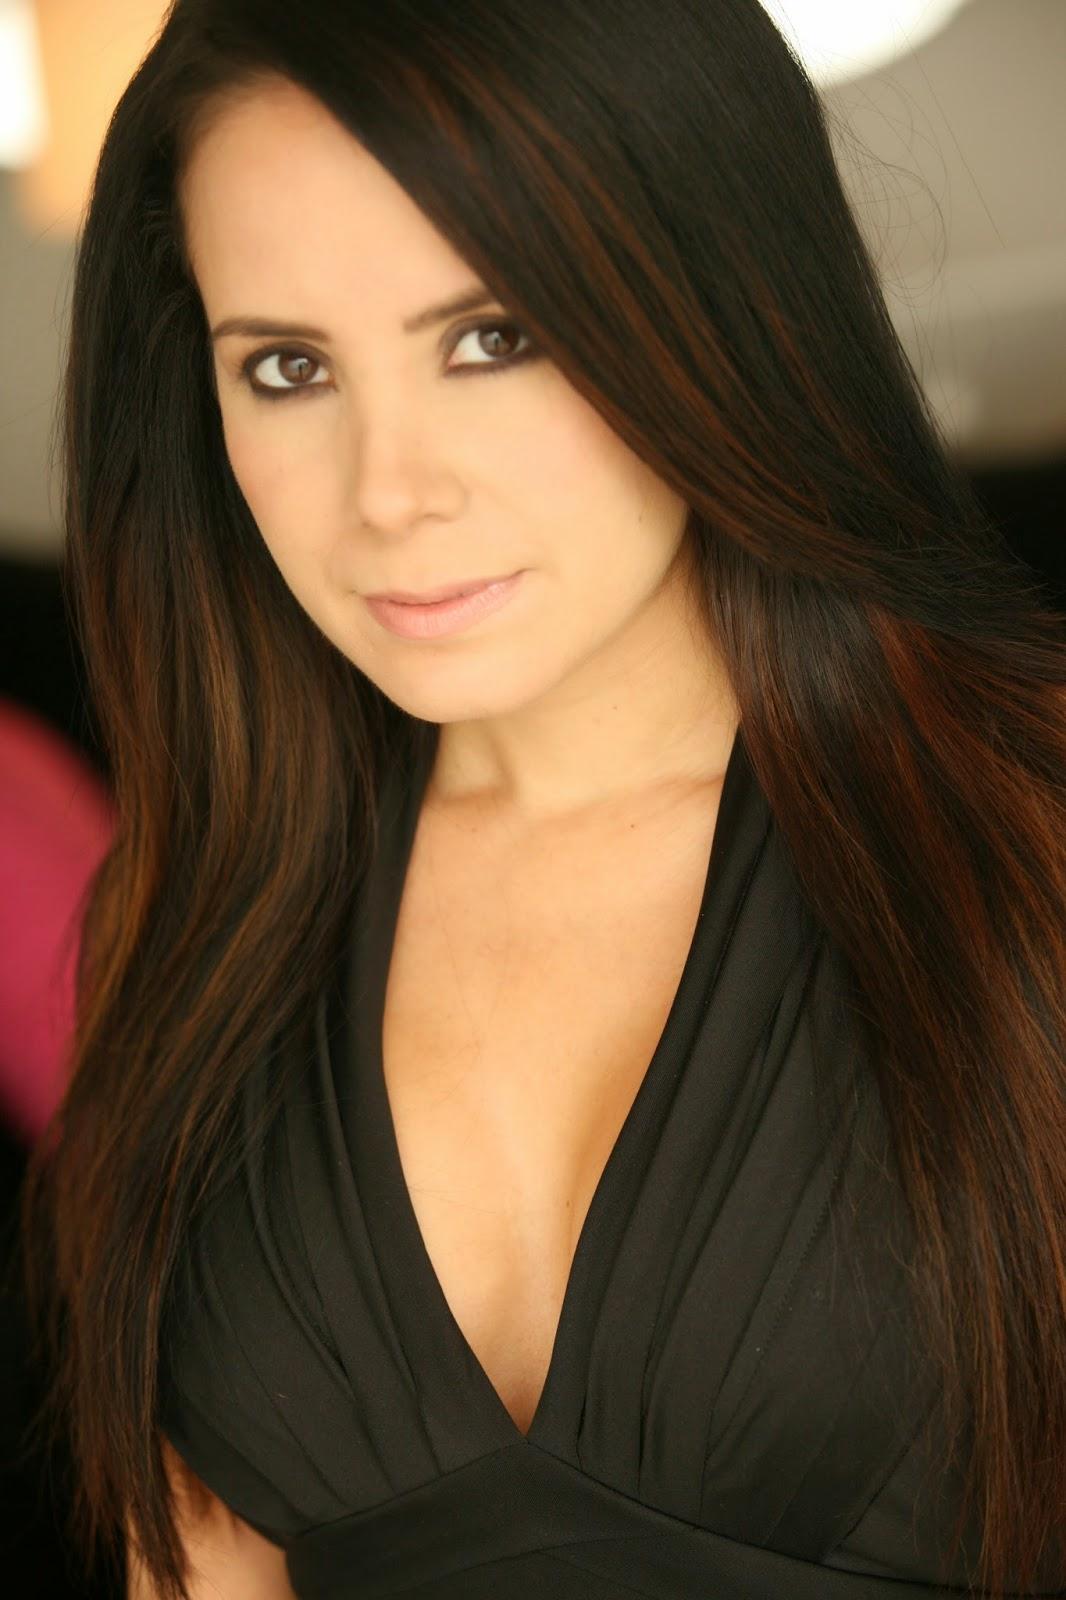 Sara Castro smile